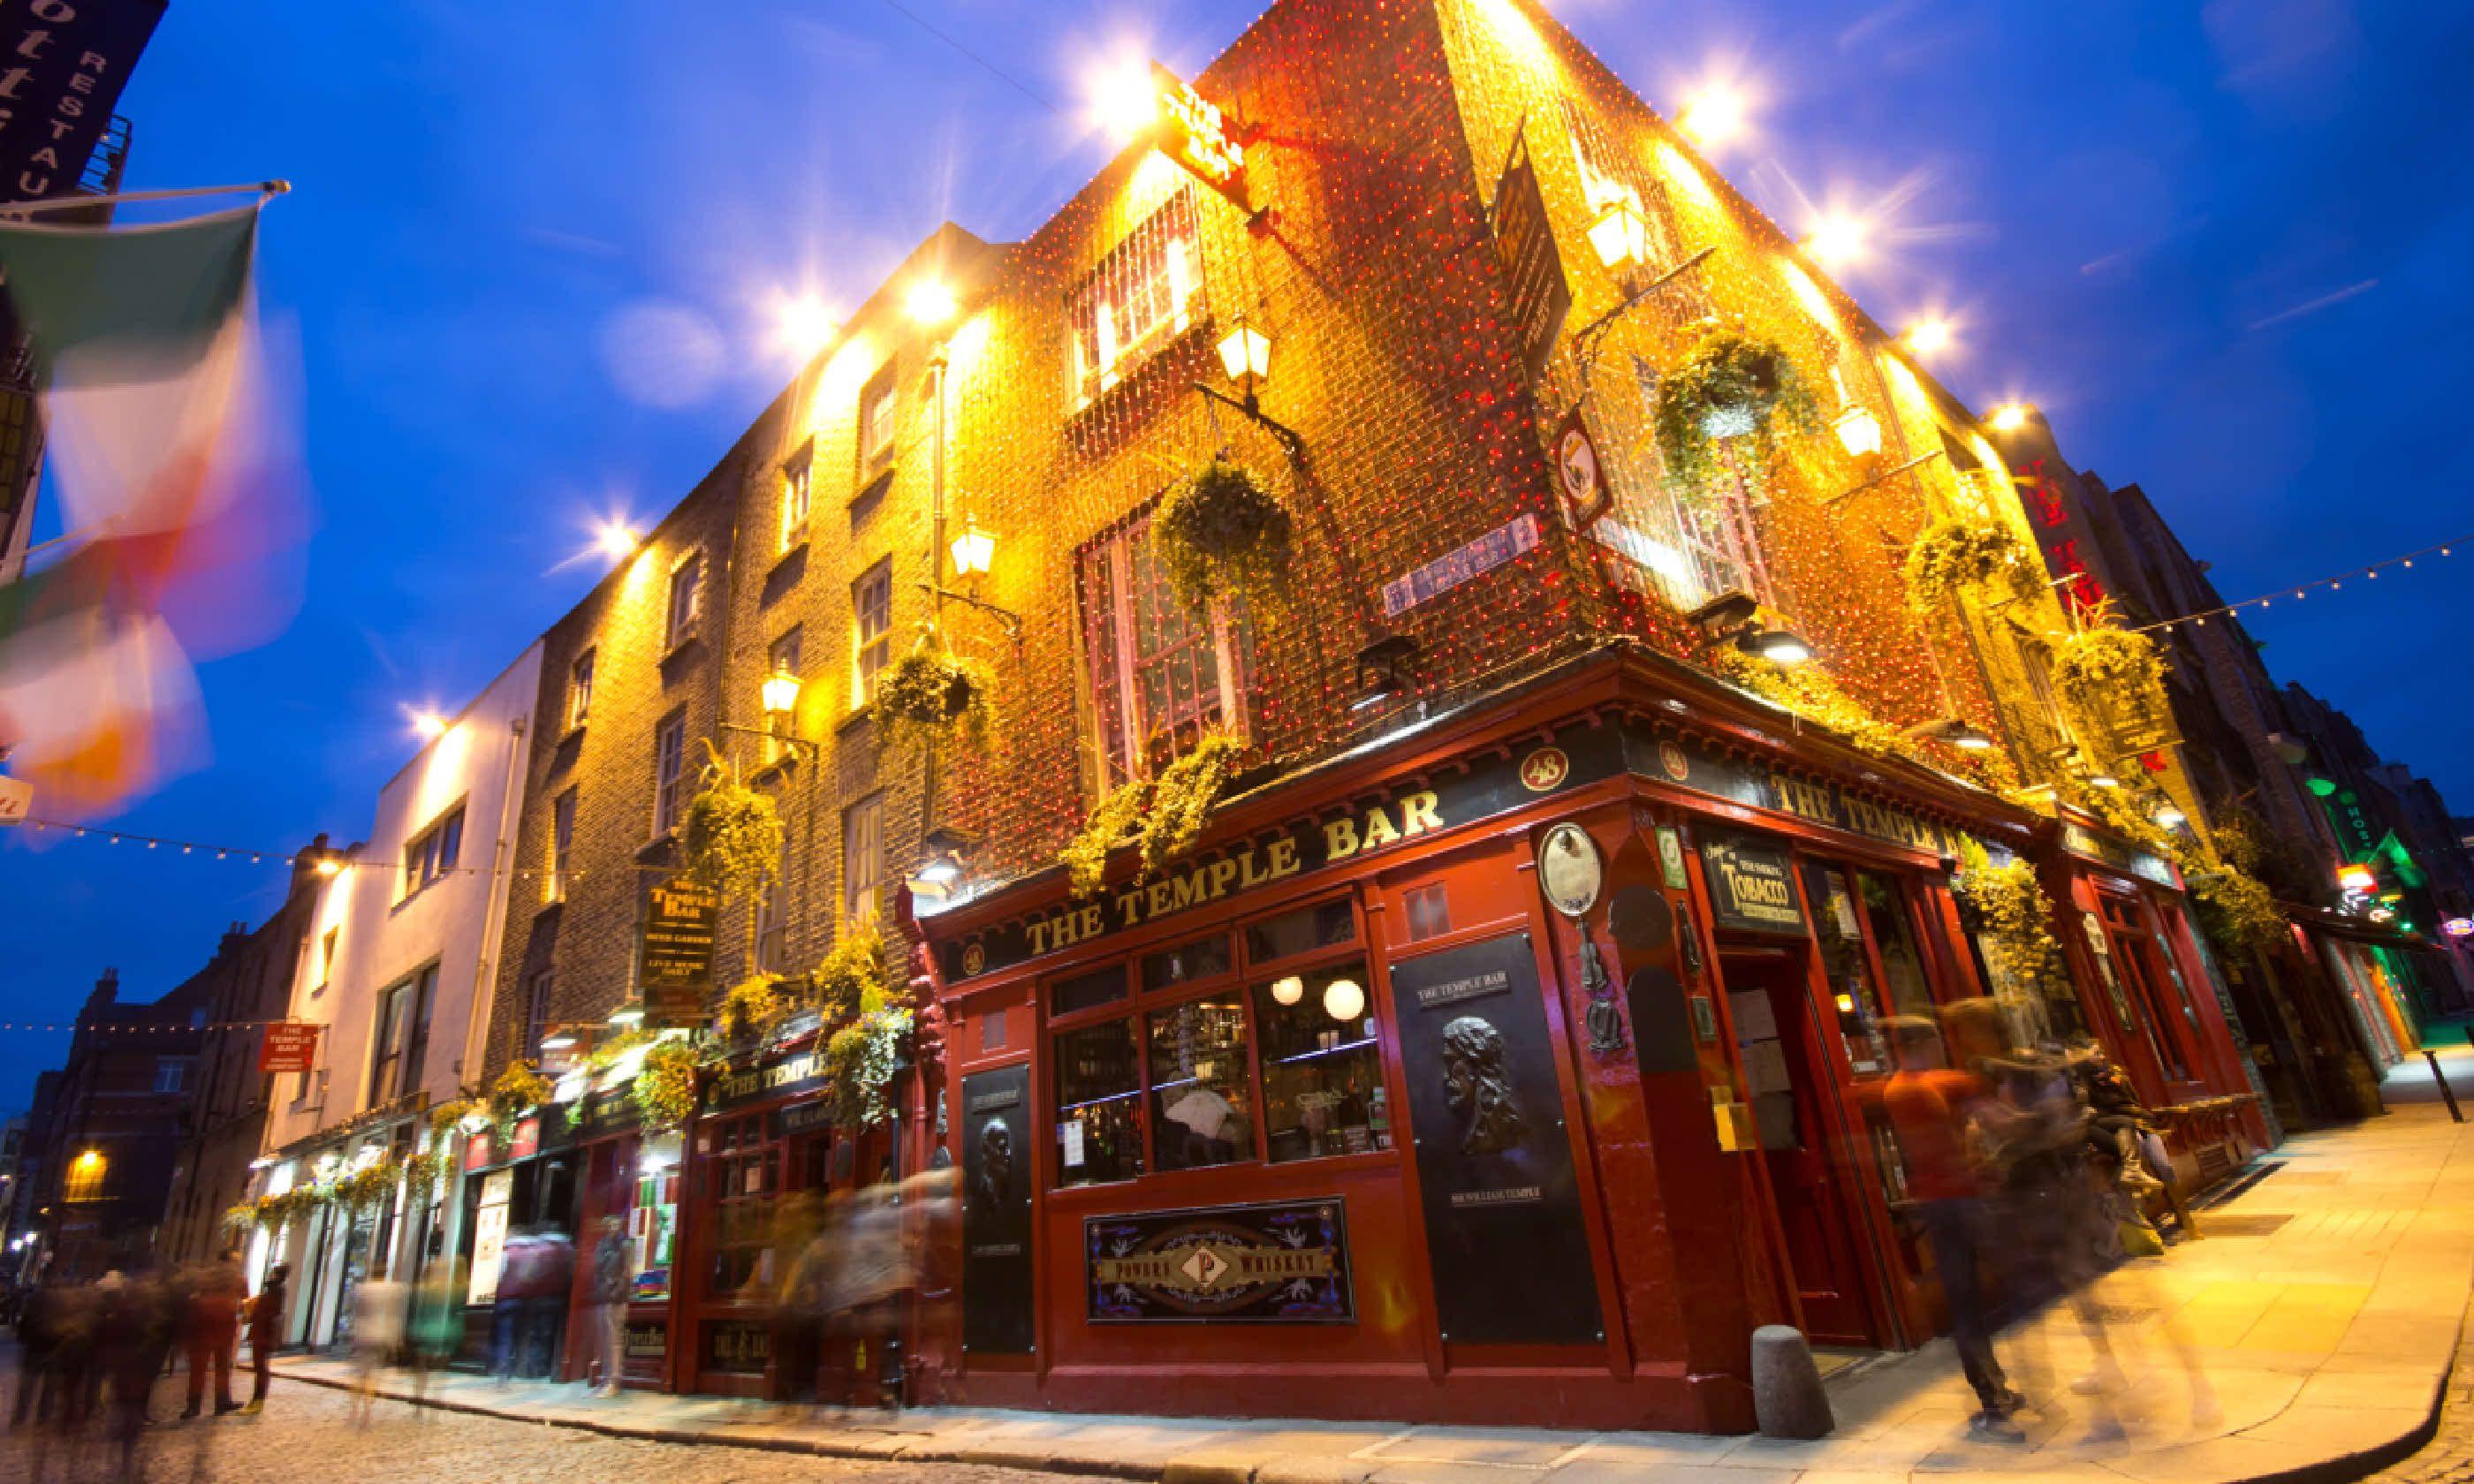 Night street scene in the Dublin